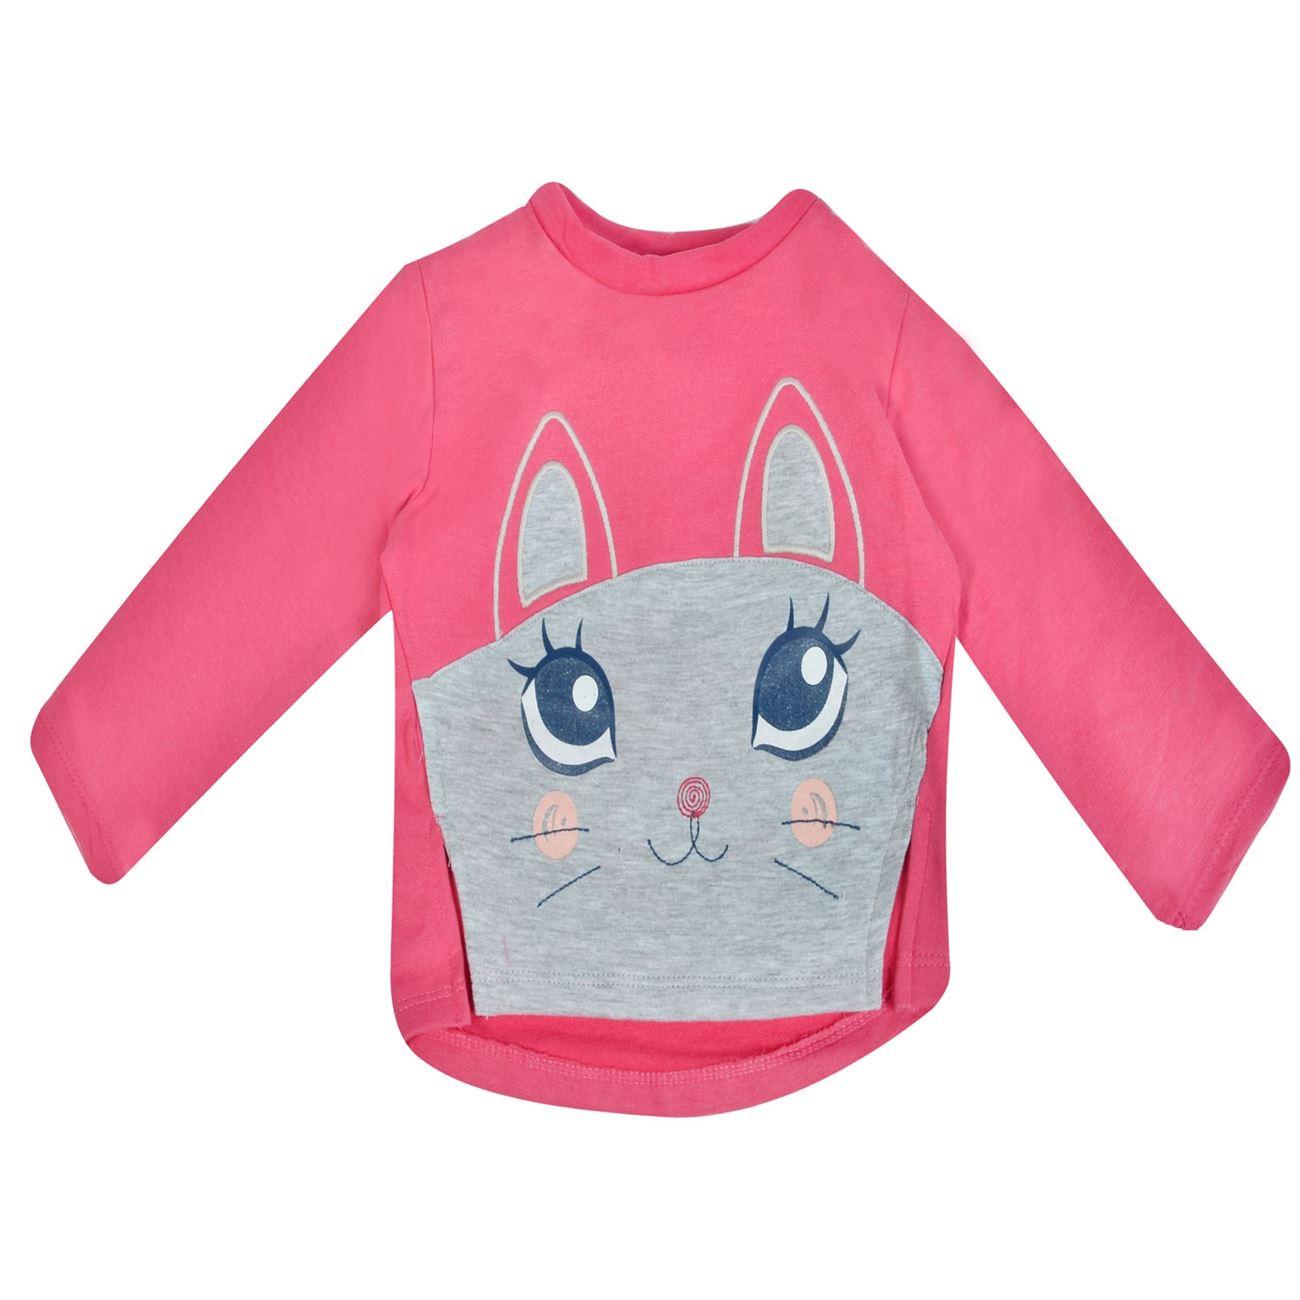 30acf315064 Μπλούζες Φούτερ Χειμερινά Βρεφικα Κορίτσι · Μπλούζα Μακρυμάνικη Παιδική  Φούξια Γατούλα